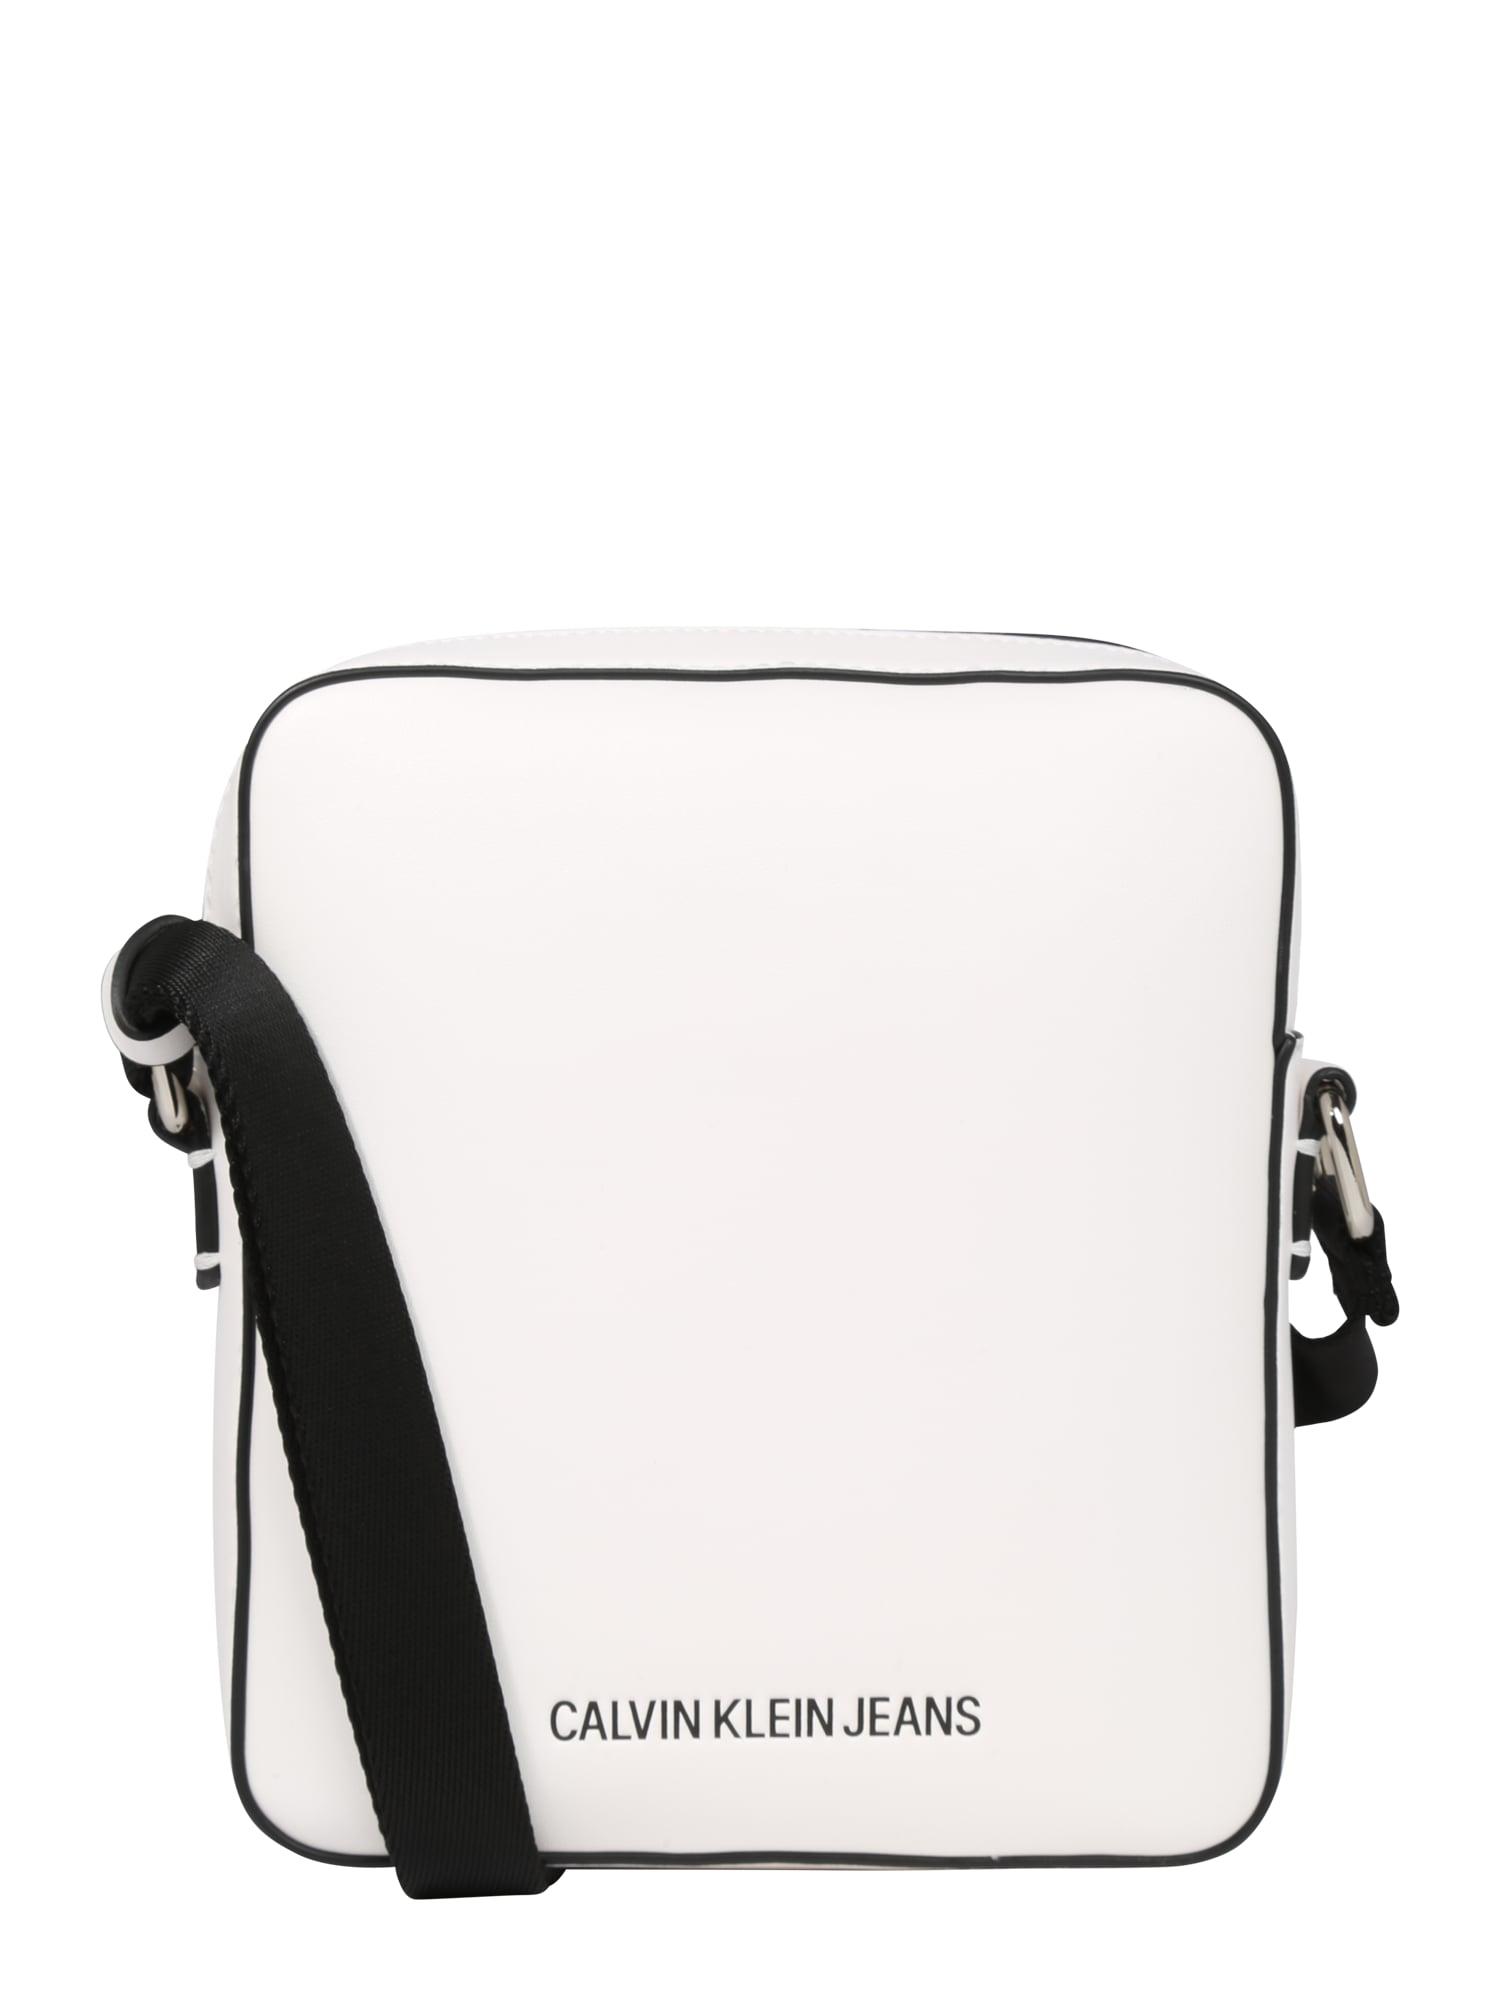 Taška přes rameno MICRO FLAT PACK černá bílá Calvin Klein Jeans